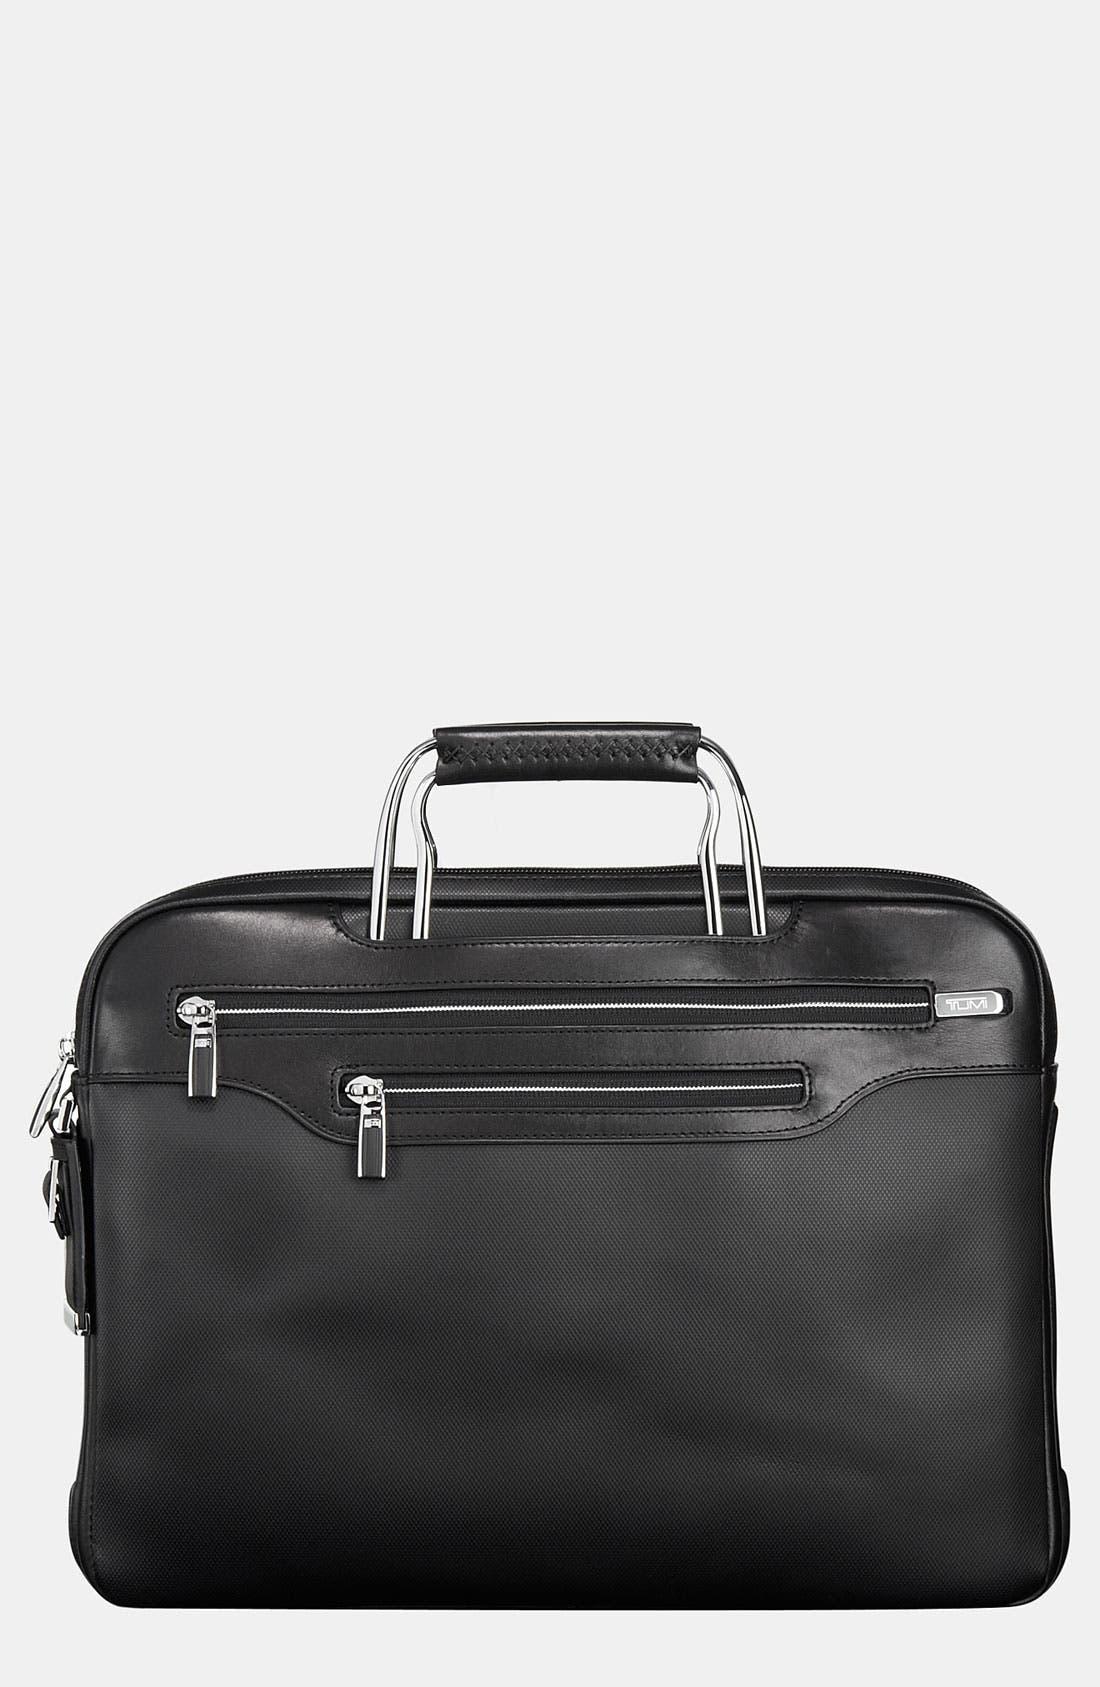 Main Image - Tumi 'Arrive - Tegel' Slim Leather Portfolio